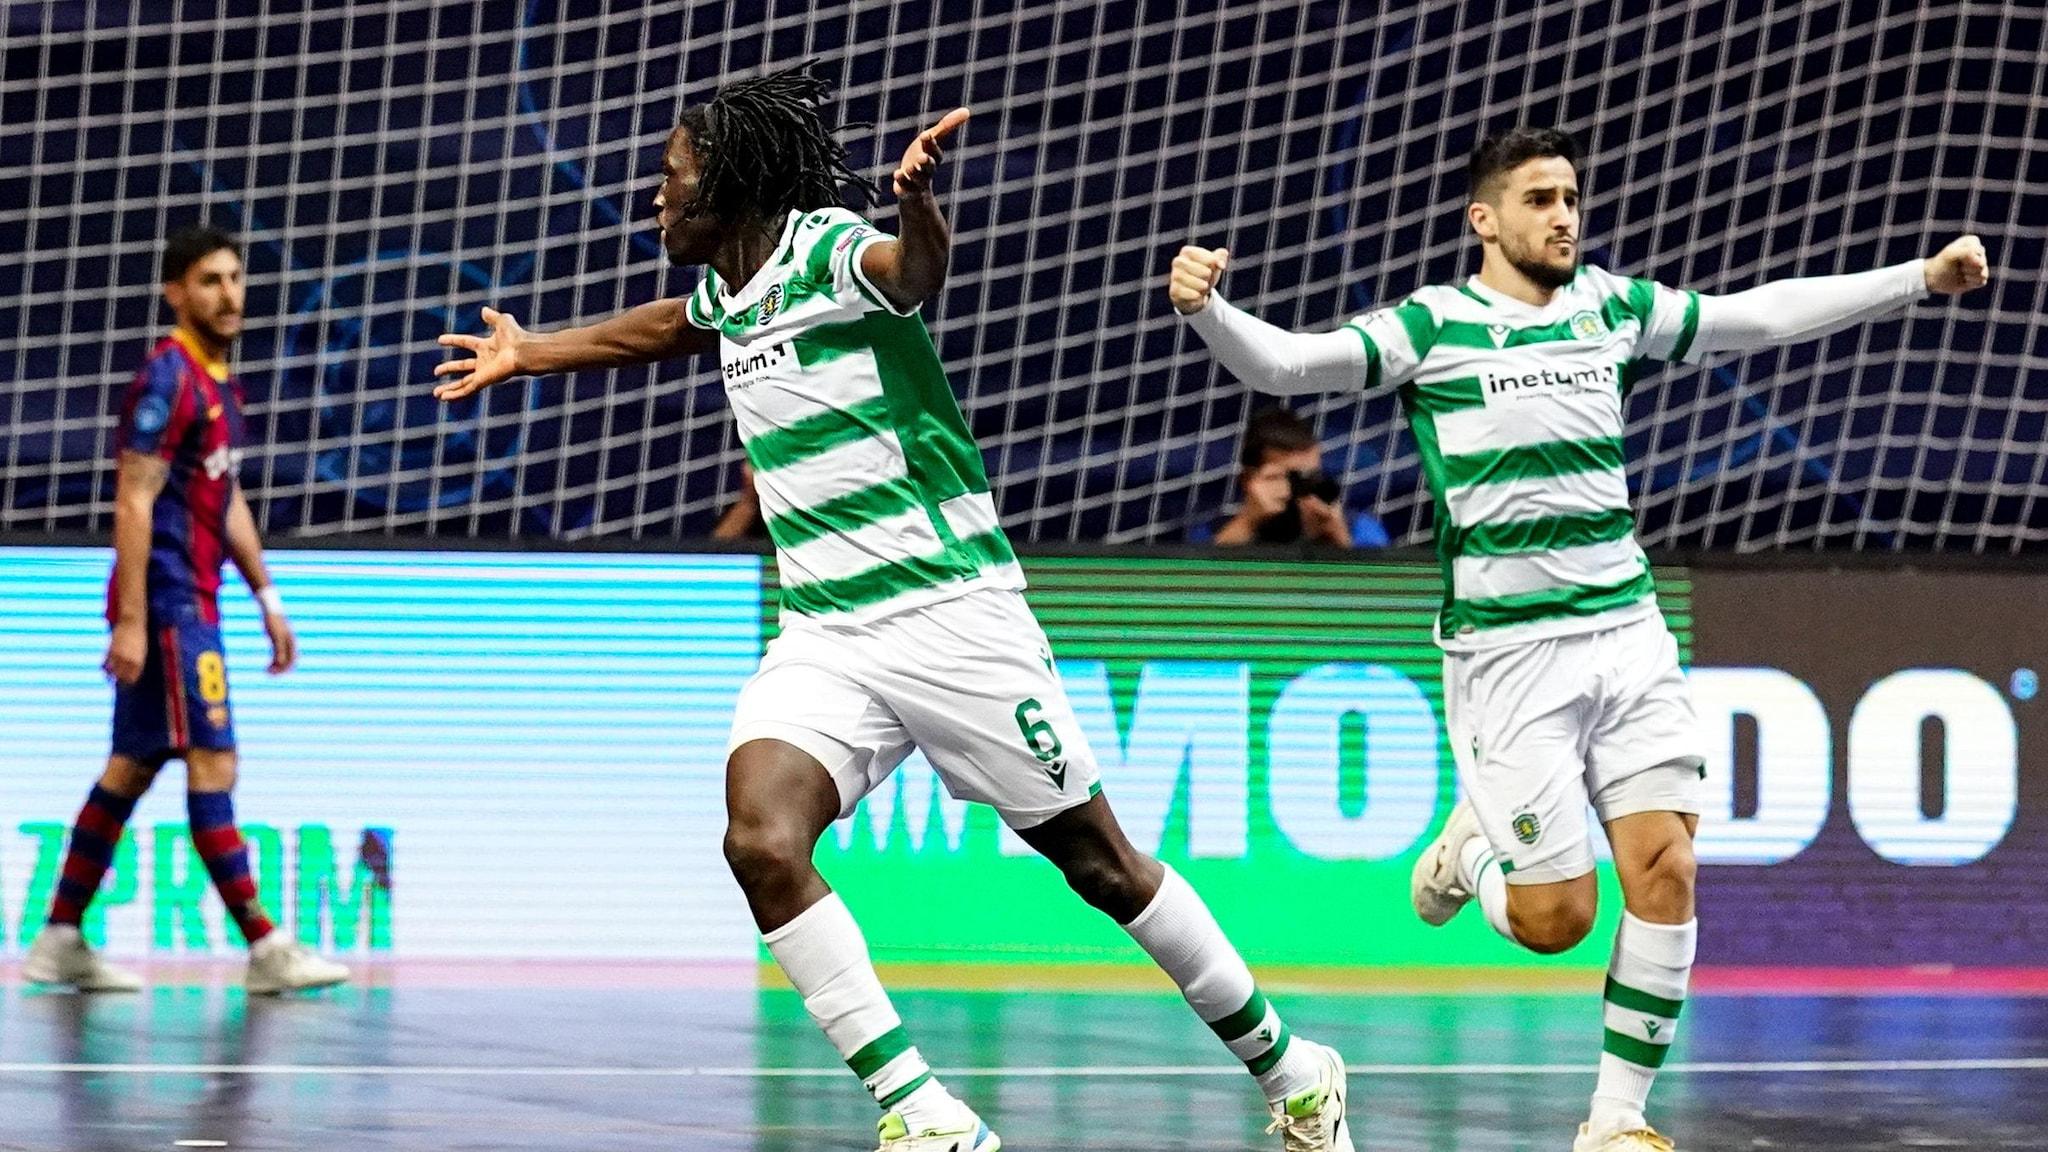 Barça-Sporting CP | Barça 3-4 Sporting, Lisbonne mené puis sacré | Futsal Champions League | UEFA.com